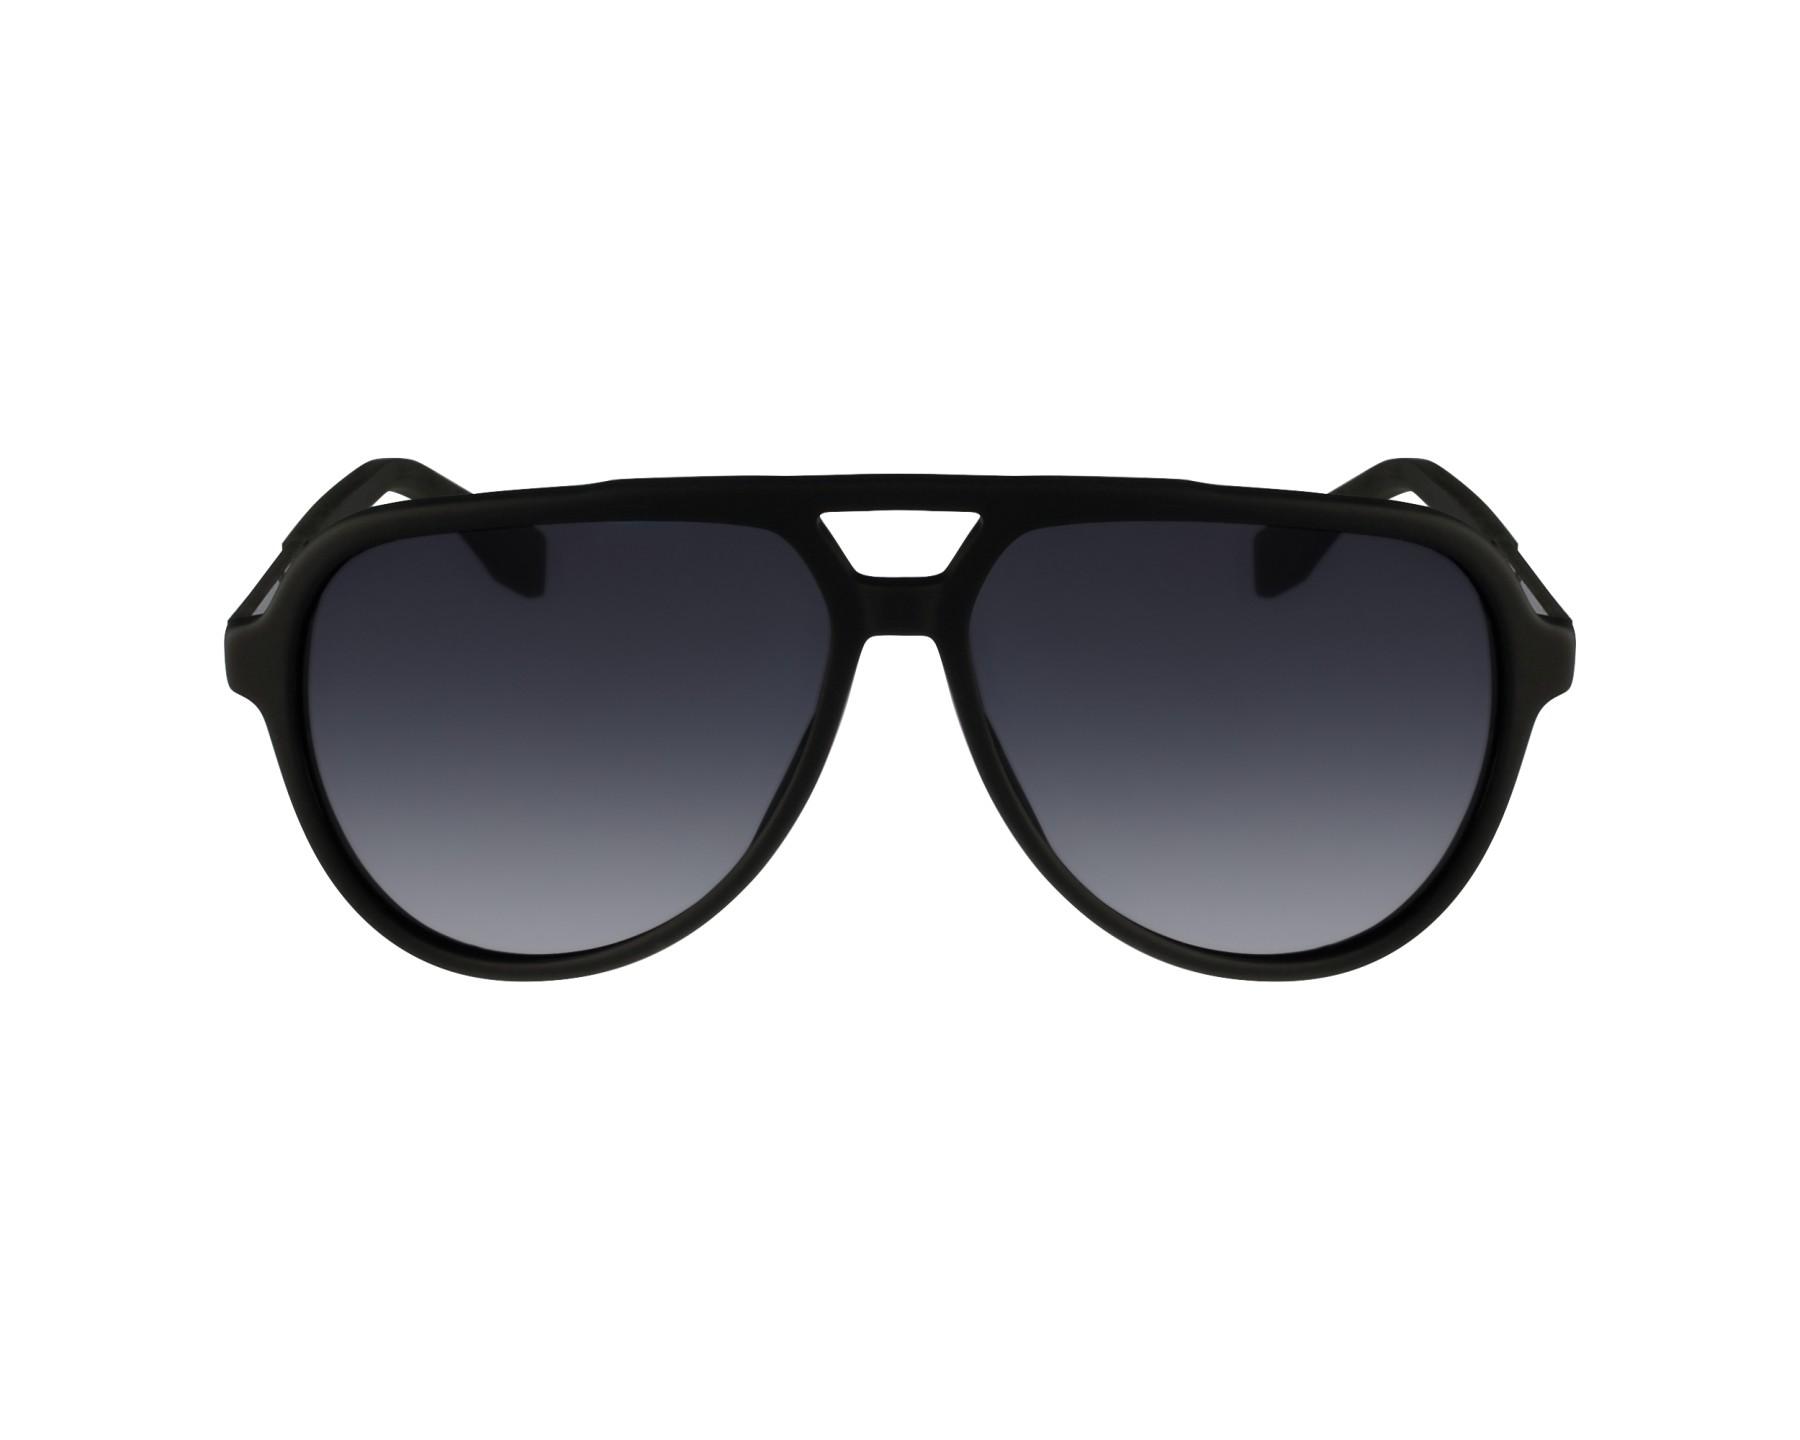 hugo boss sunglasses hxf0  hugo boss sunglasses